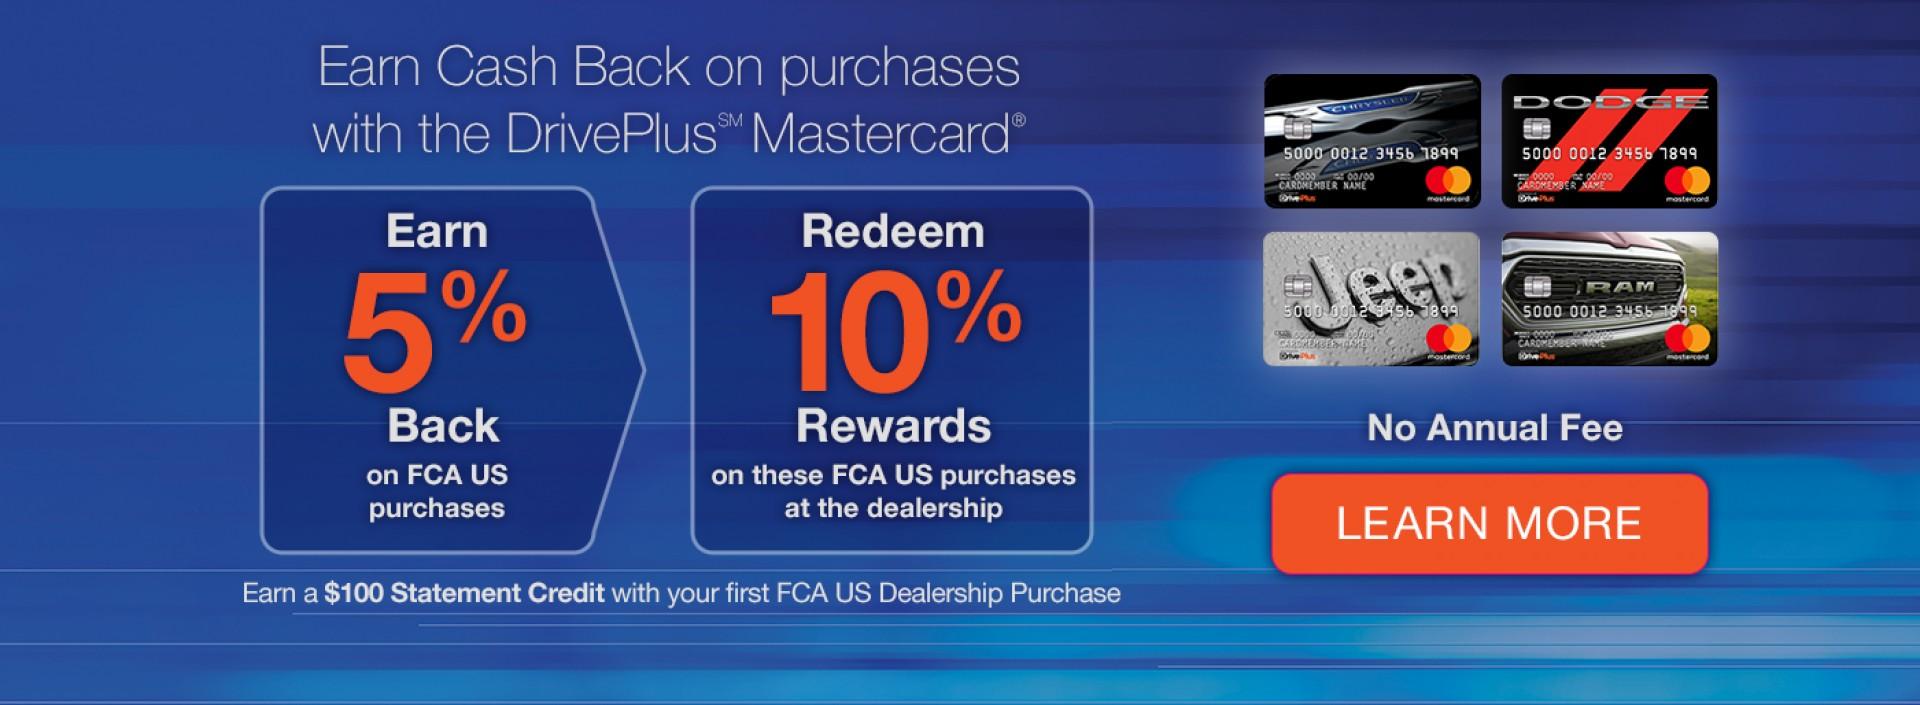 DrivePlus Mastercard